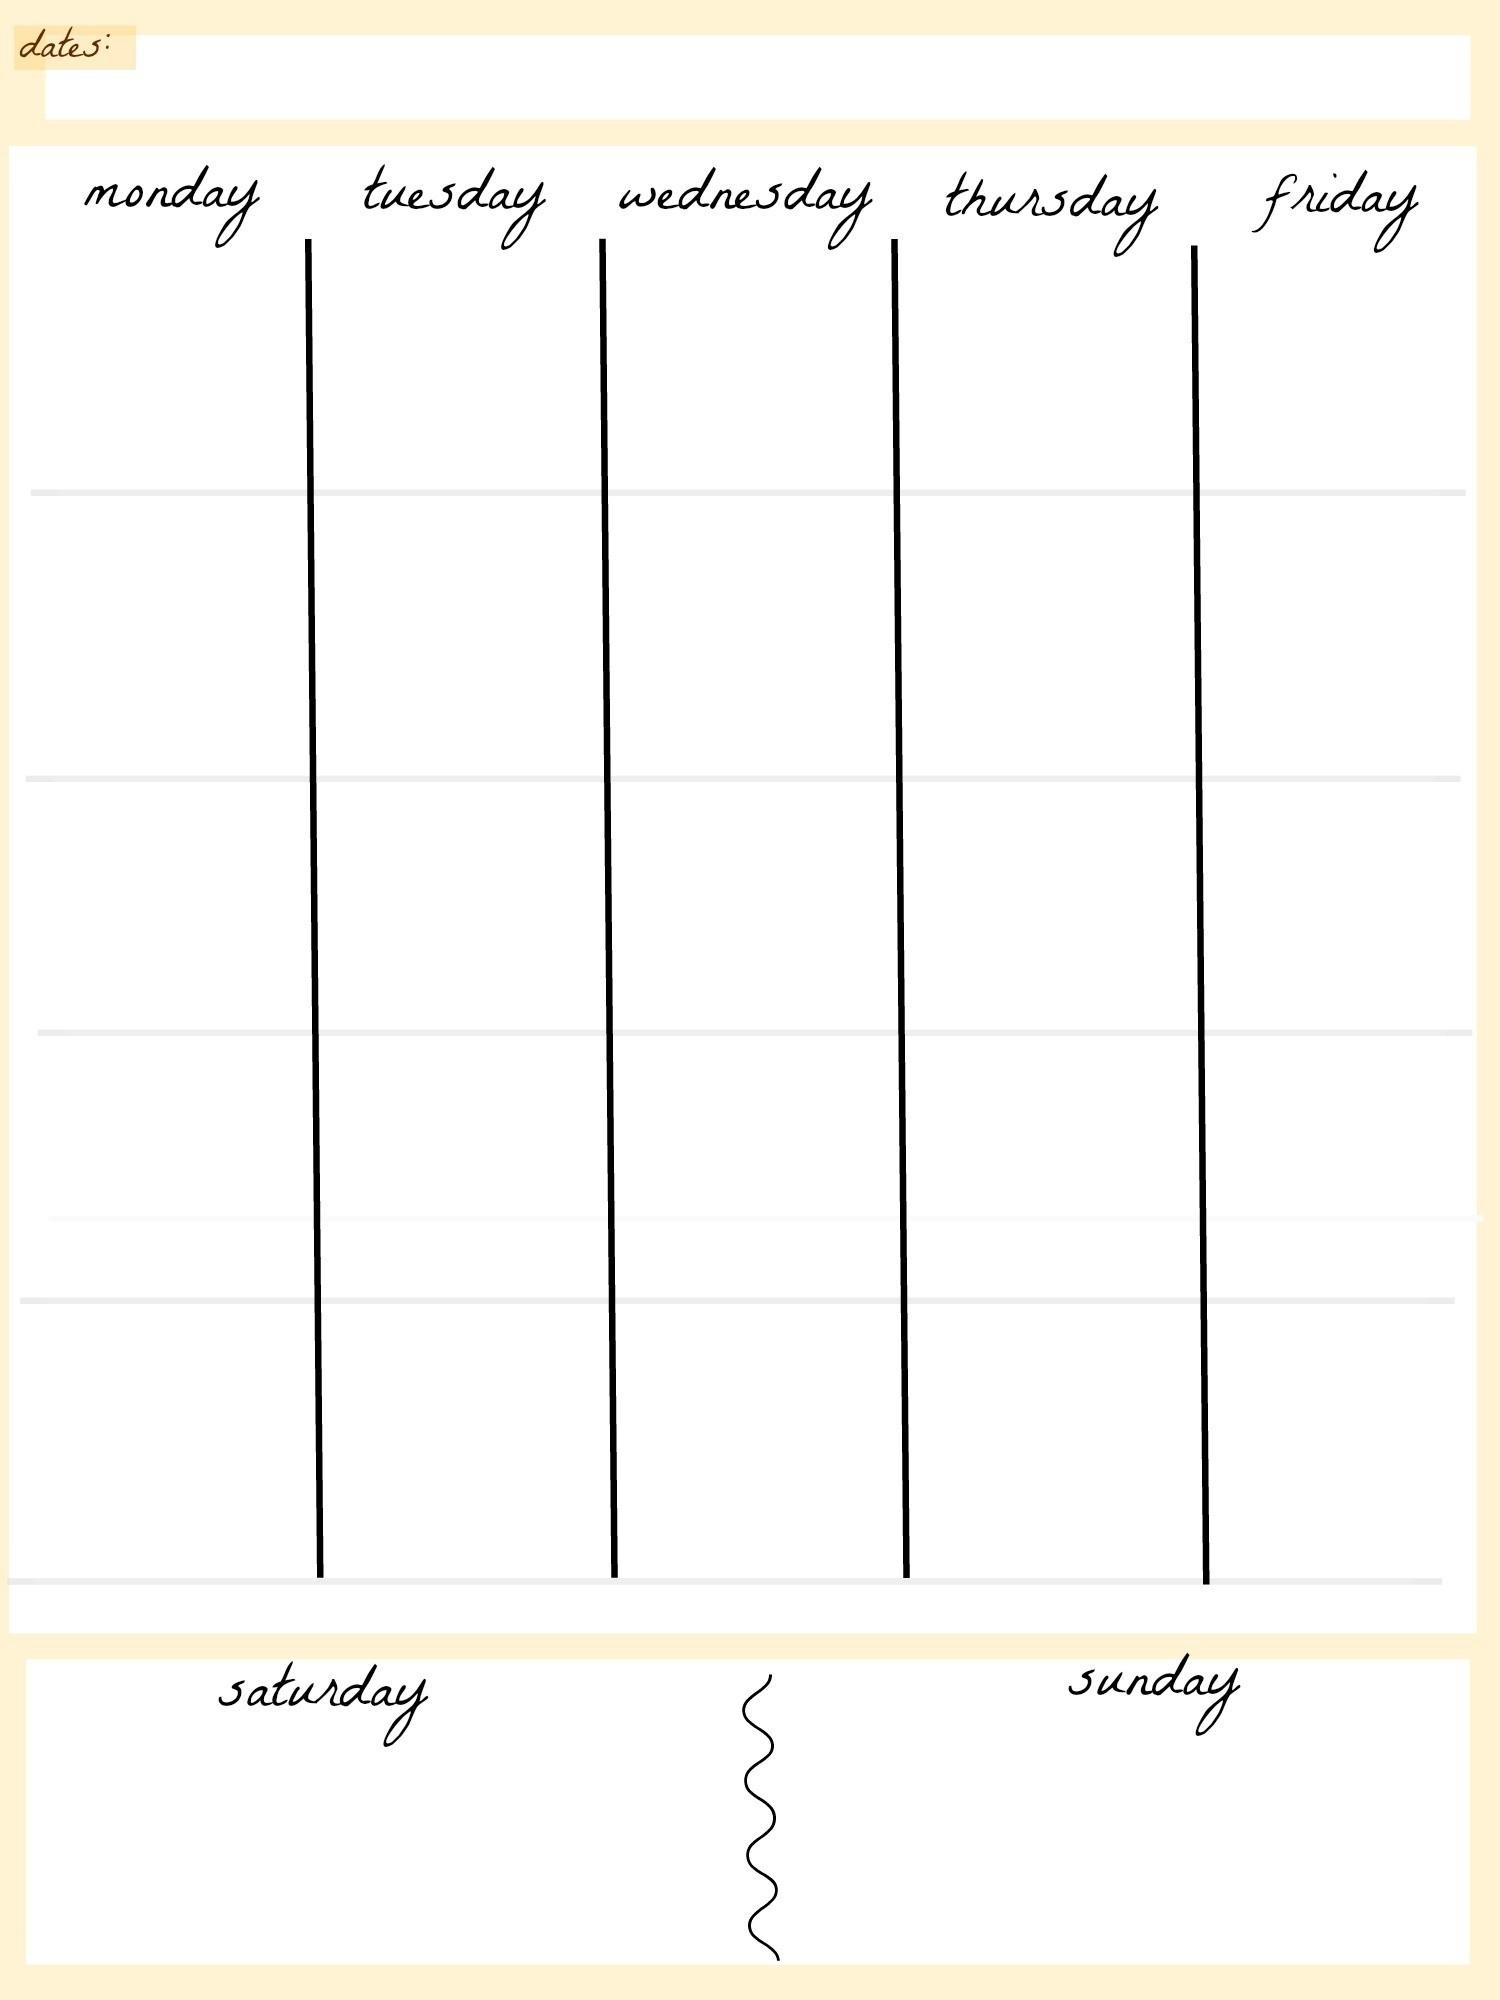 Free Blank 5 Day Weekly Calendar - 2018 Calendar Template  Free Blank 5 Day Calendar